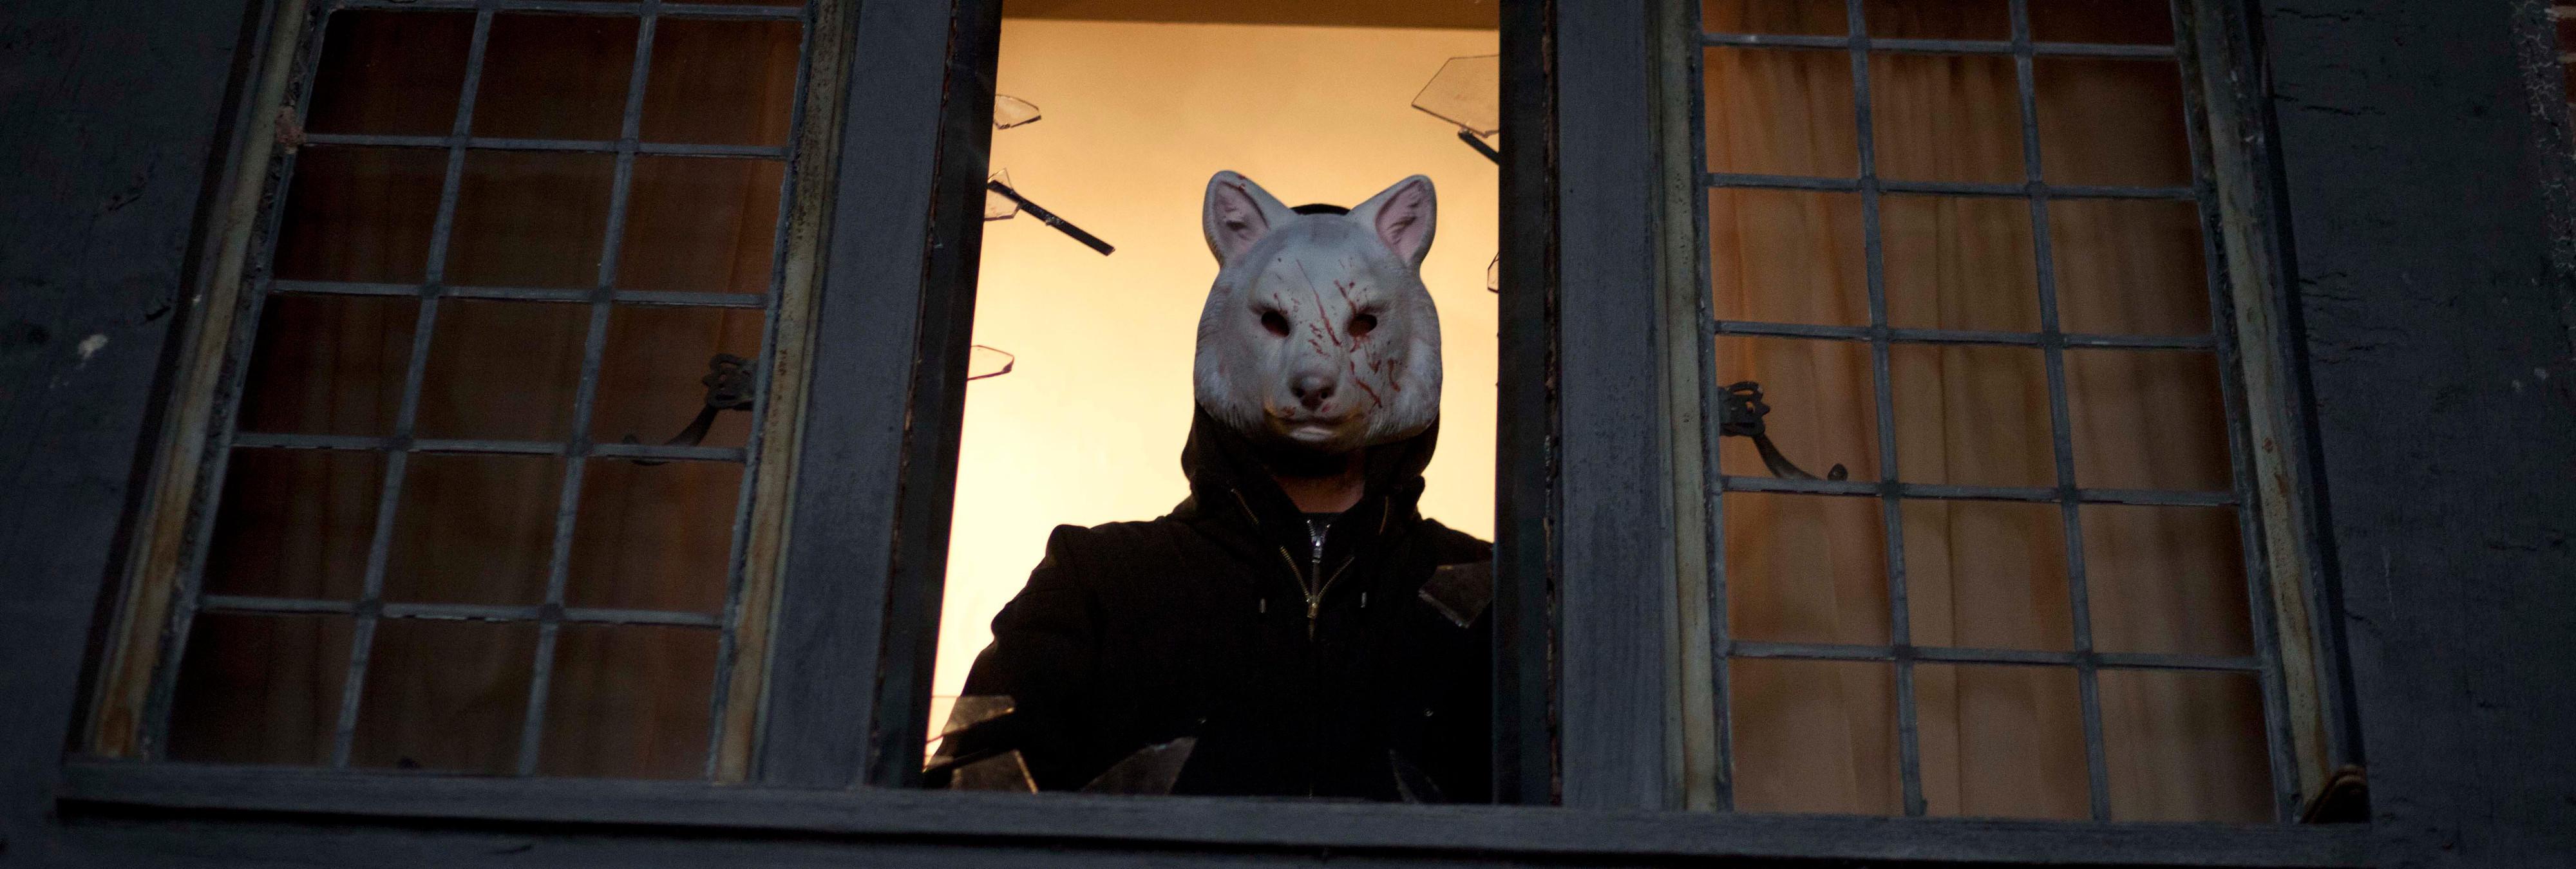 14 películas de miedo alternativas que debes ver este Halloween